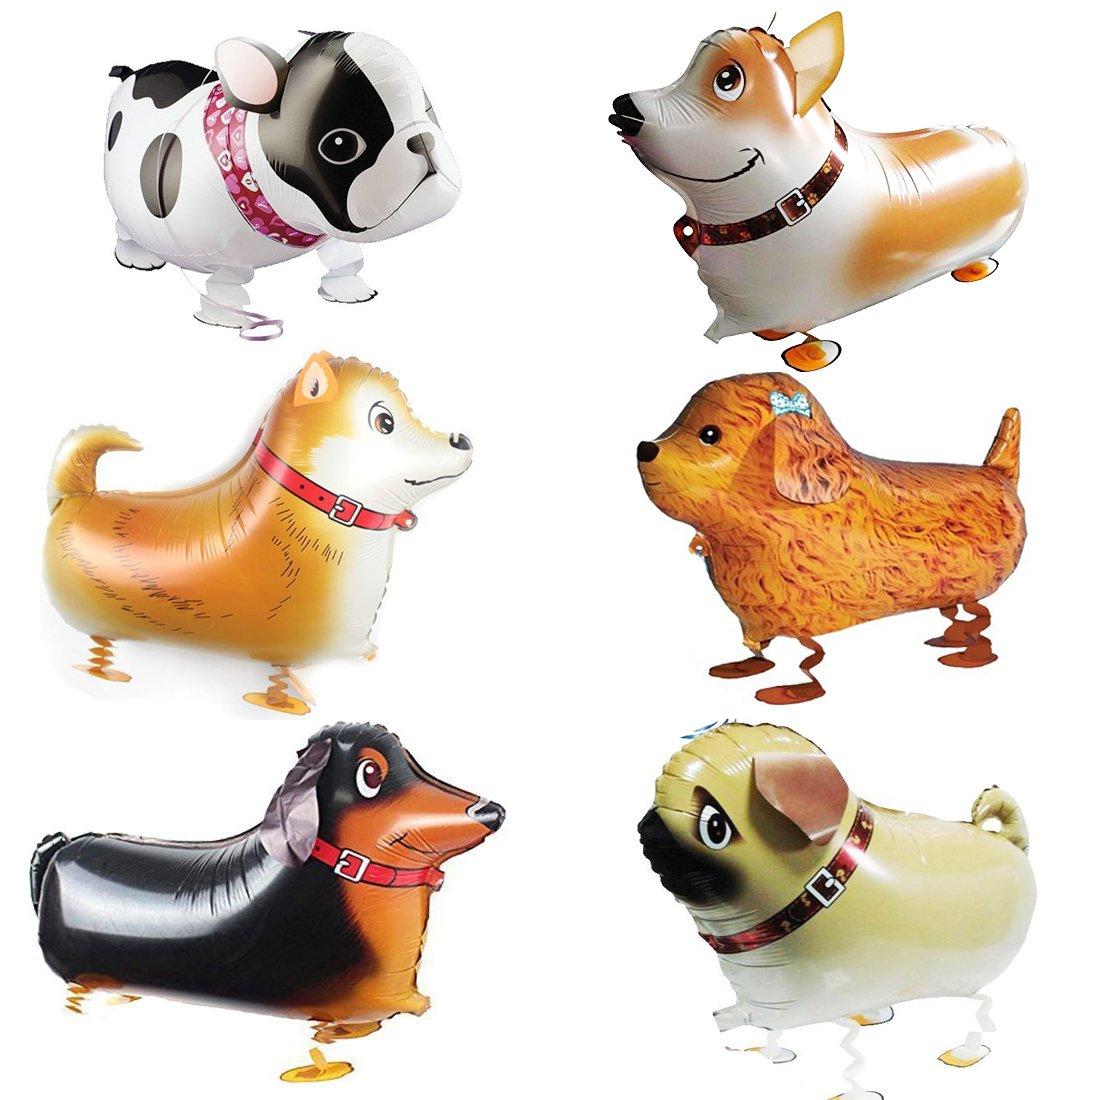 Weoxpr Pet Dog Balloons Walking Animal Balloon Pet Balloons Air Walkers for Kids Gift Birthday Par